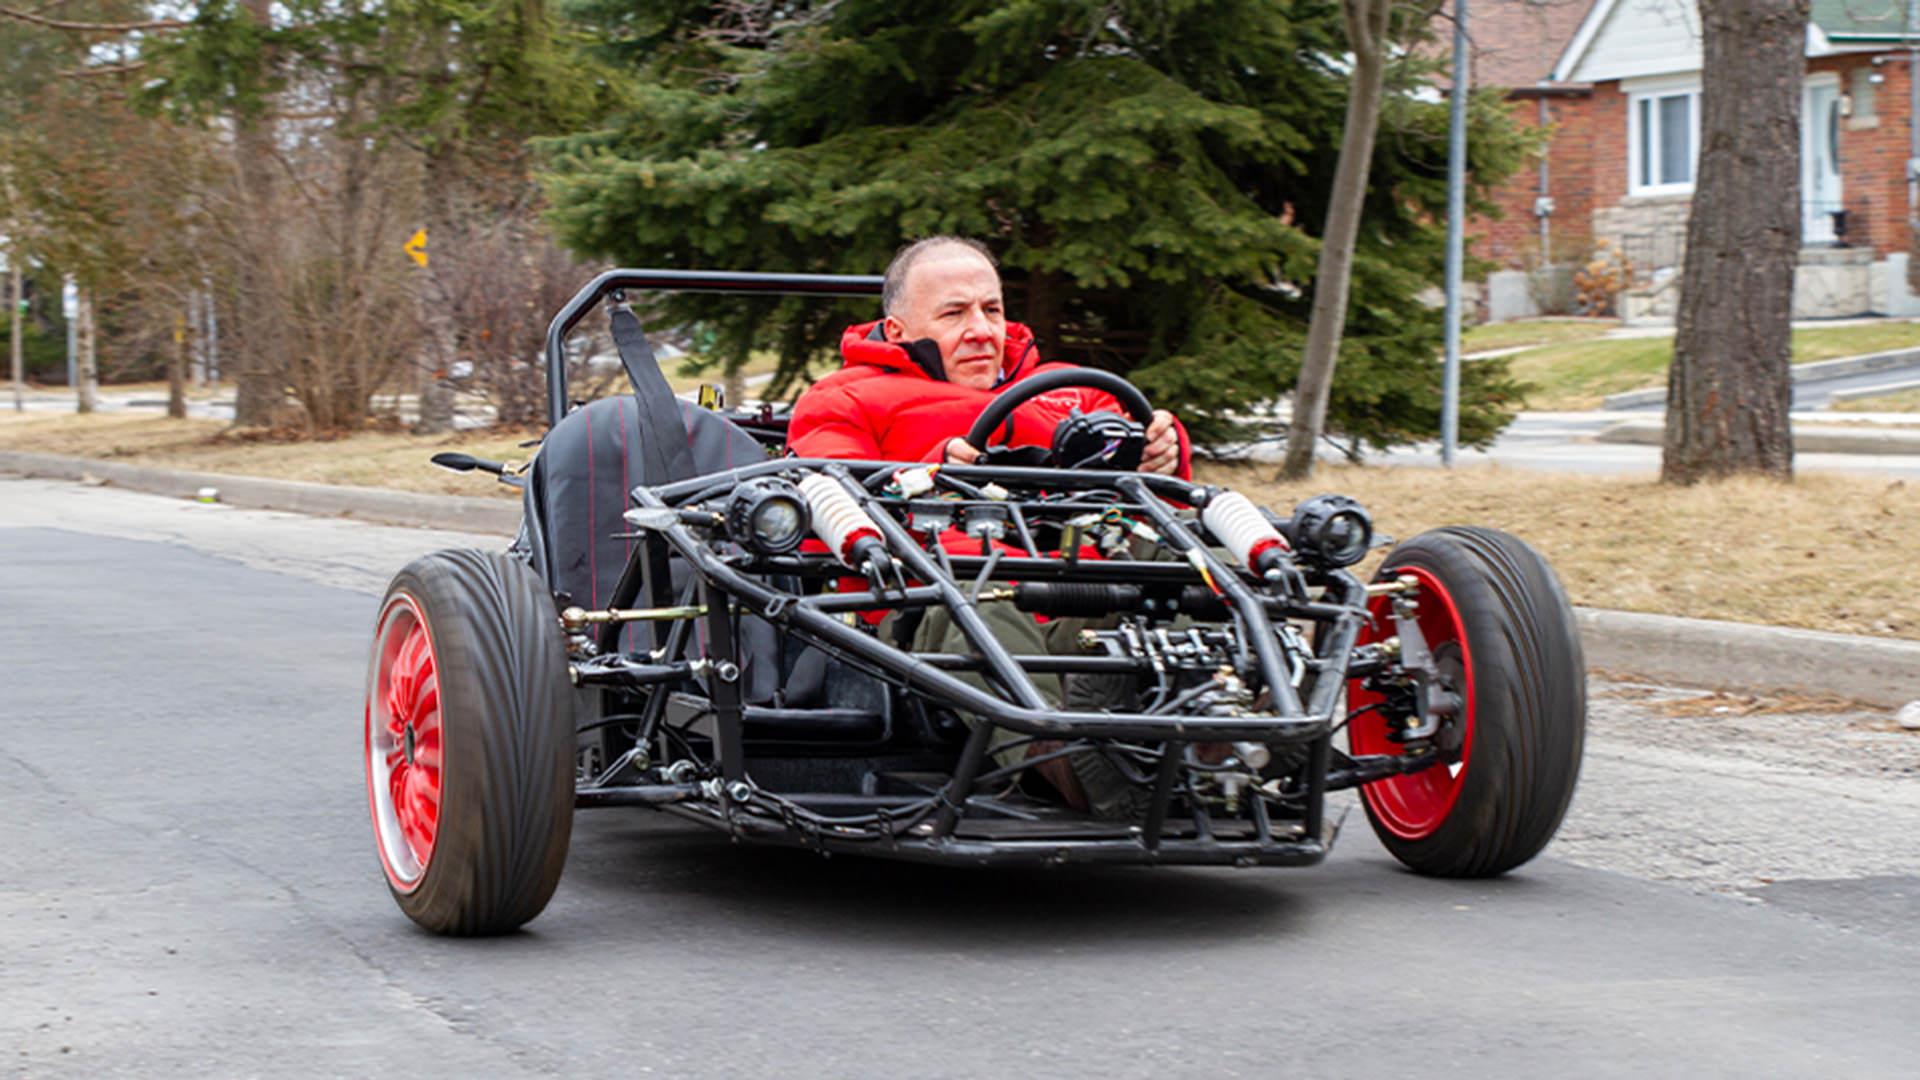 نمونه اولیه خودروی الکتریکی سه چرخ دیمک اسپریتوس / Daymak Spiritus three-wheeled EV